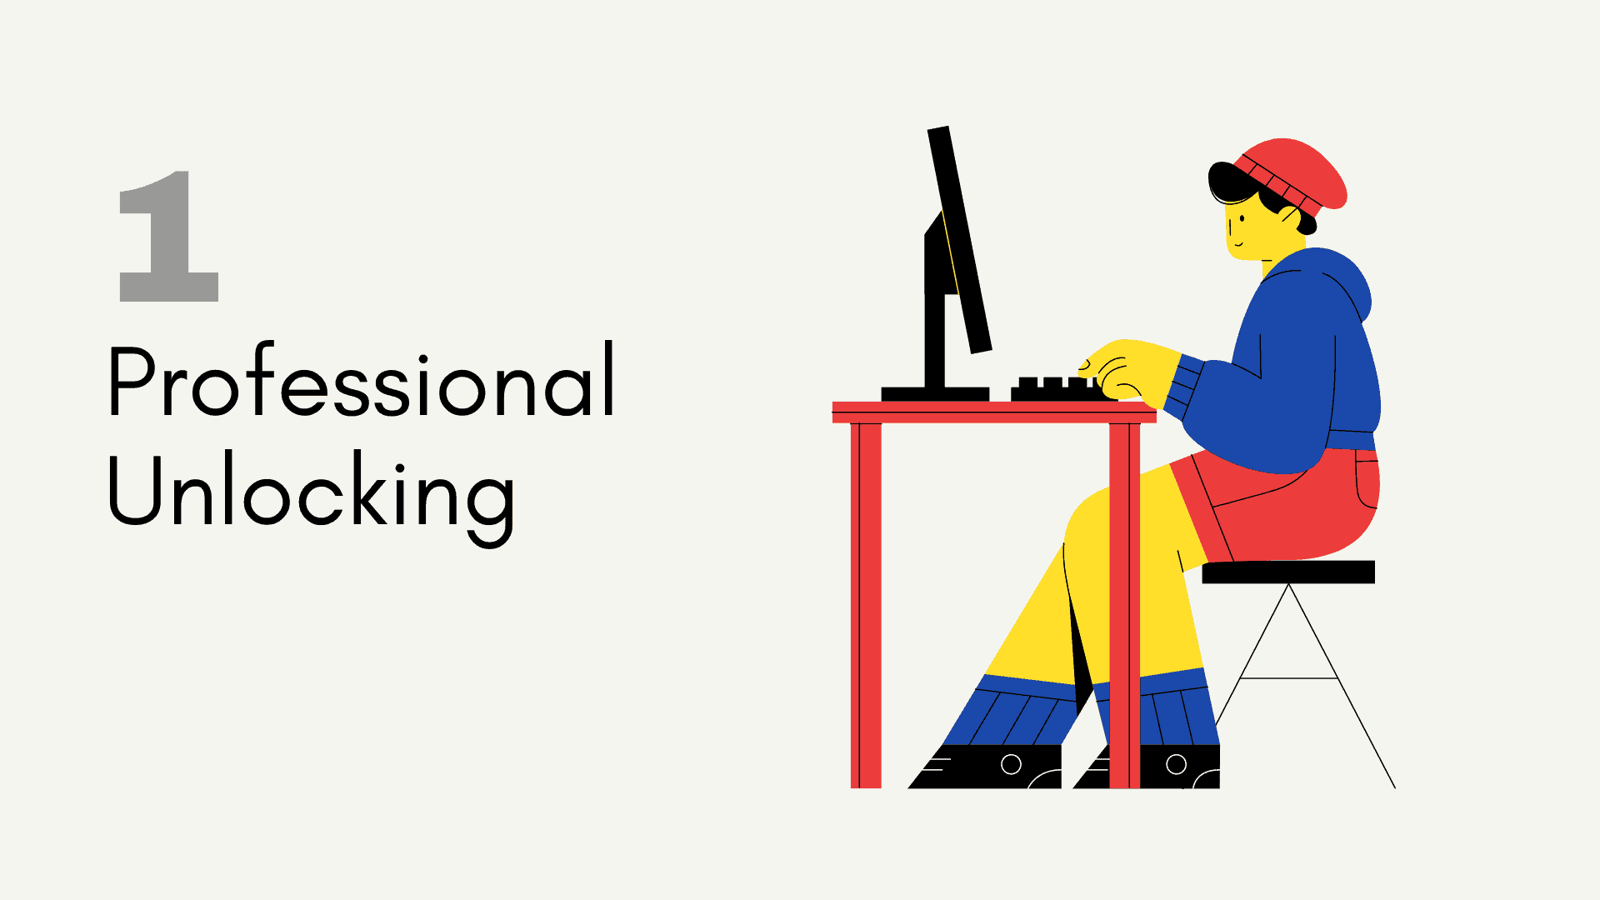 ee professional unlock